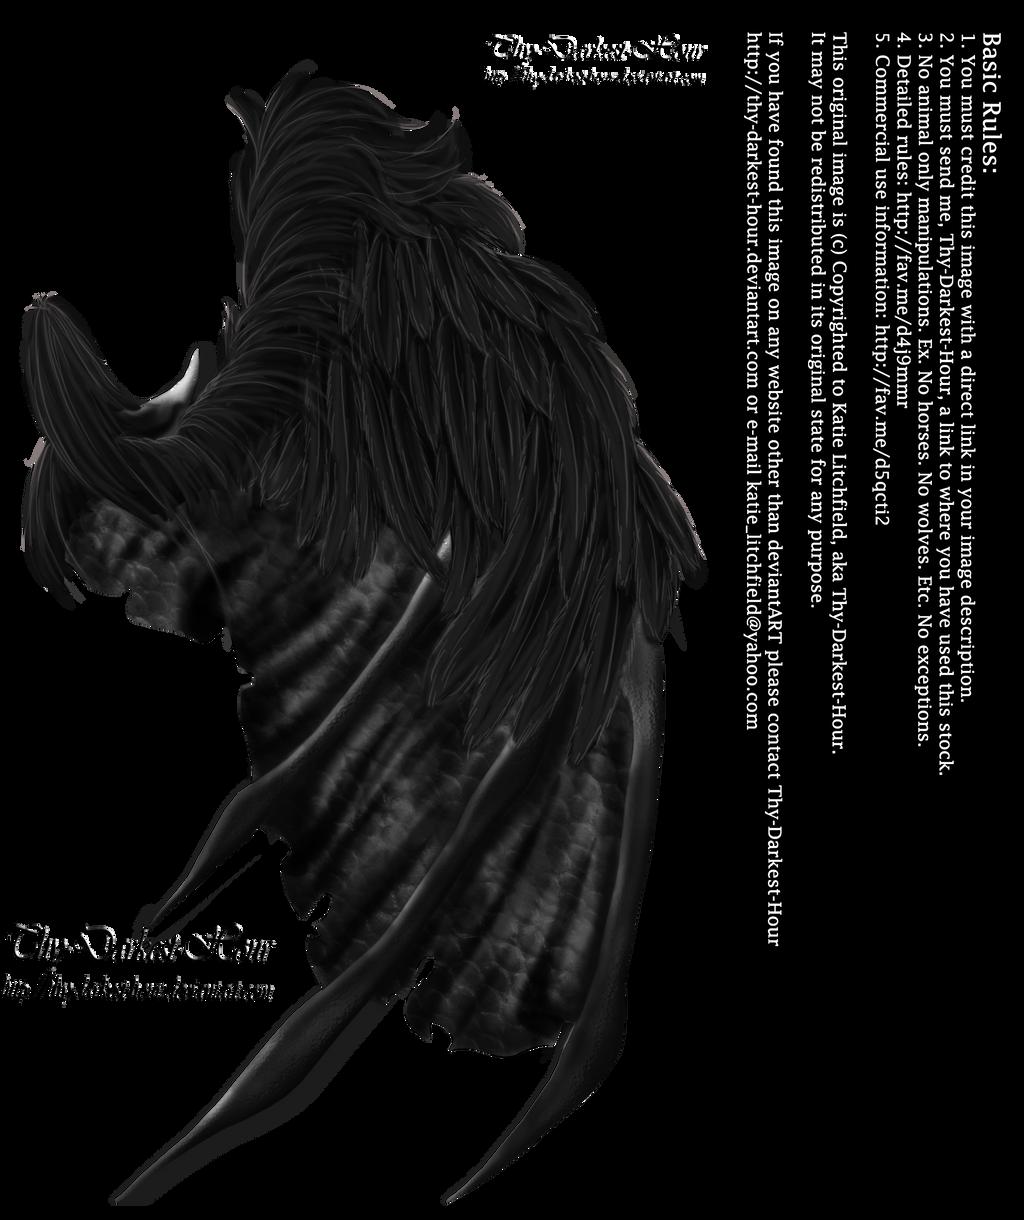 Alfa img - Showing > Anime Feathered Demon Wings